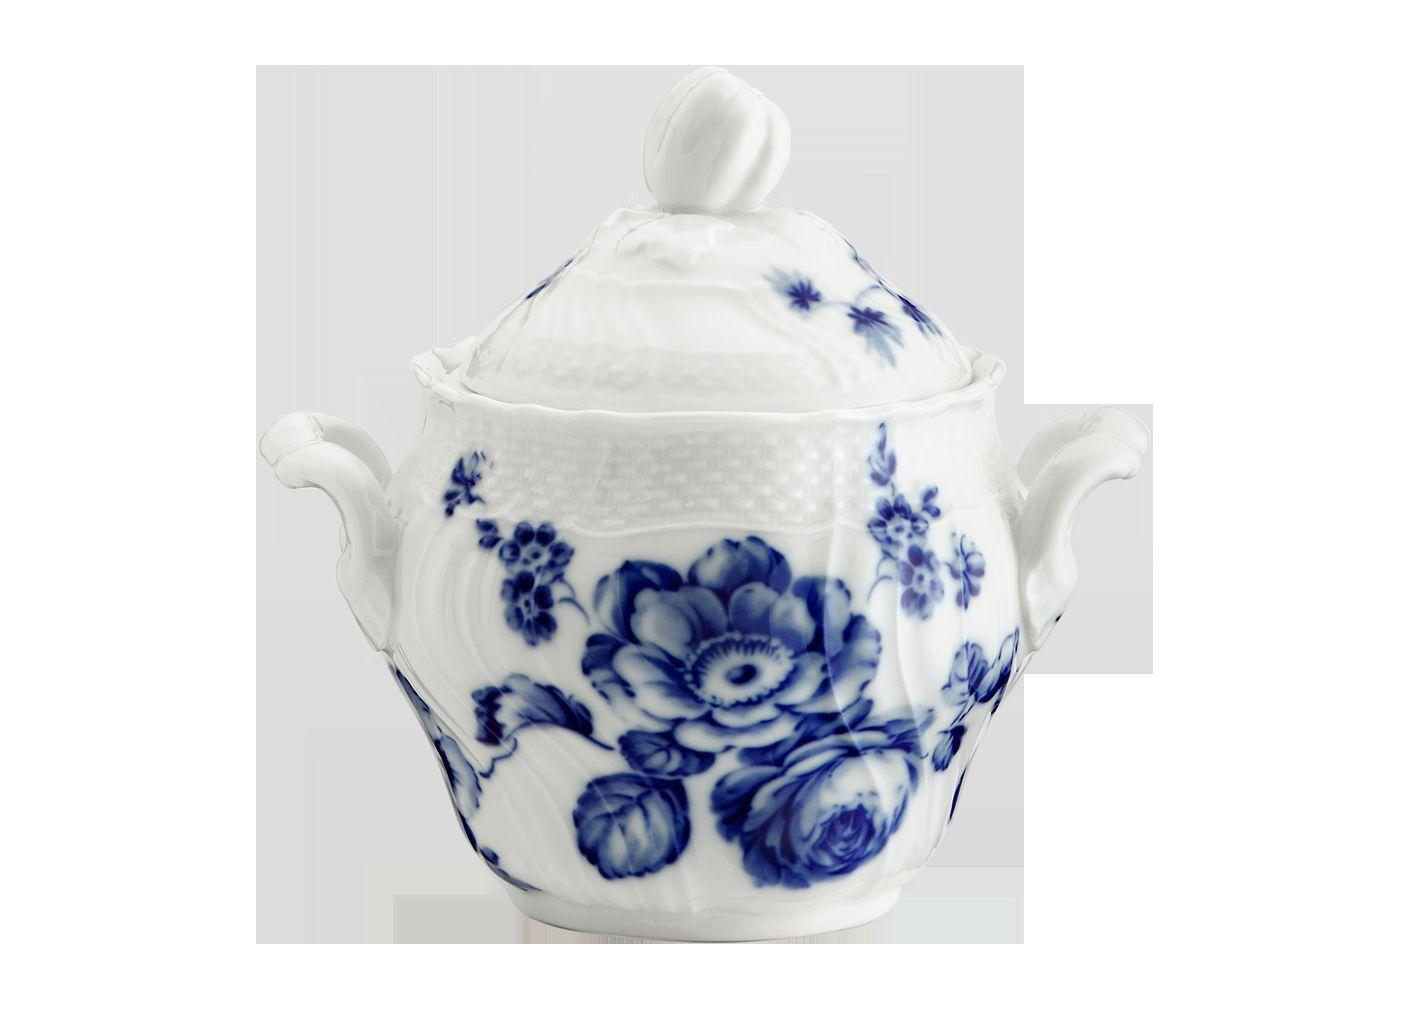 Richard Ginori - Rose bleu - Sucrier café cc 490 pour 12 gens Revendeur